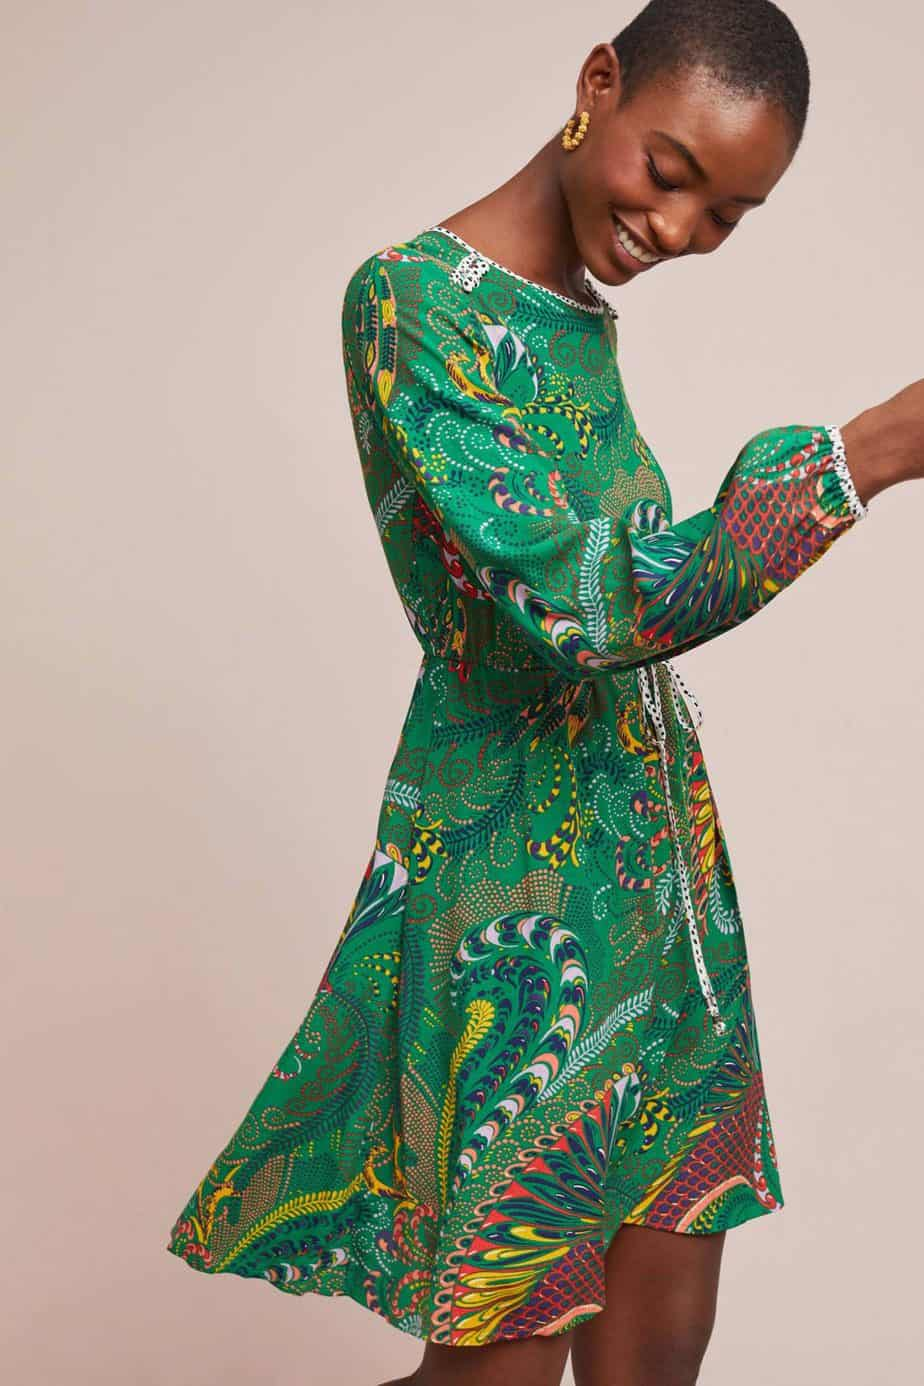 ANTHROPOLOGIE. מחיר שמלה: 599.90 שקל. צילום: יח״צ חו״ל